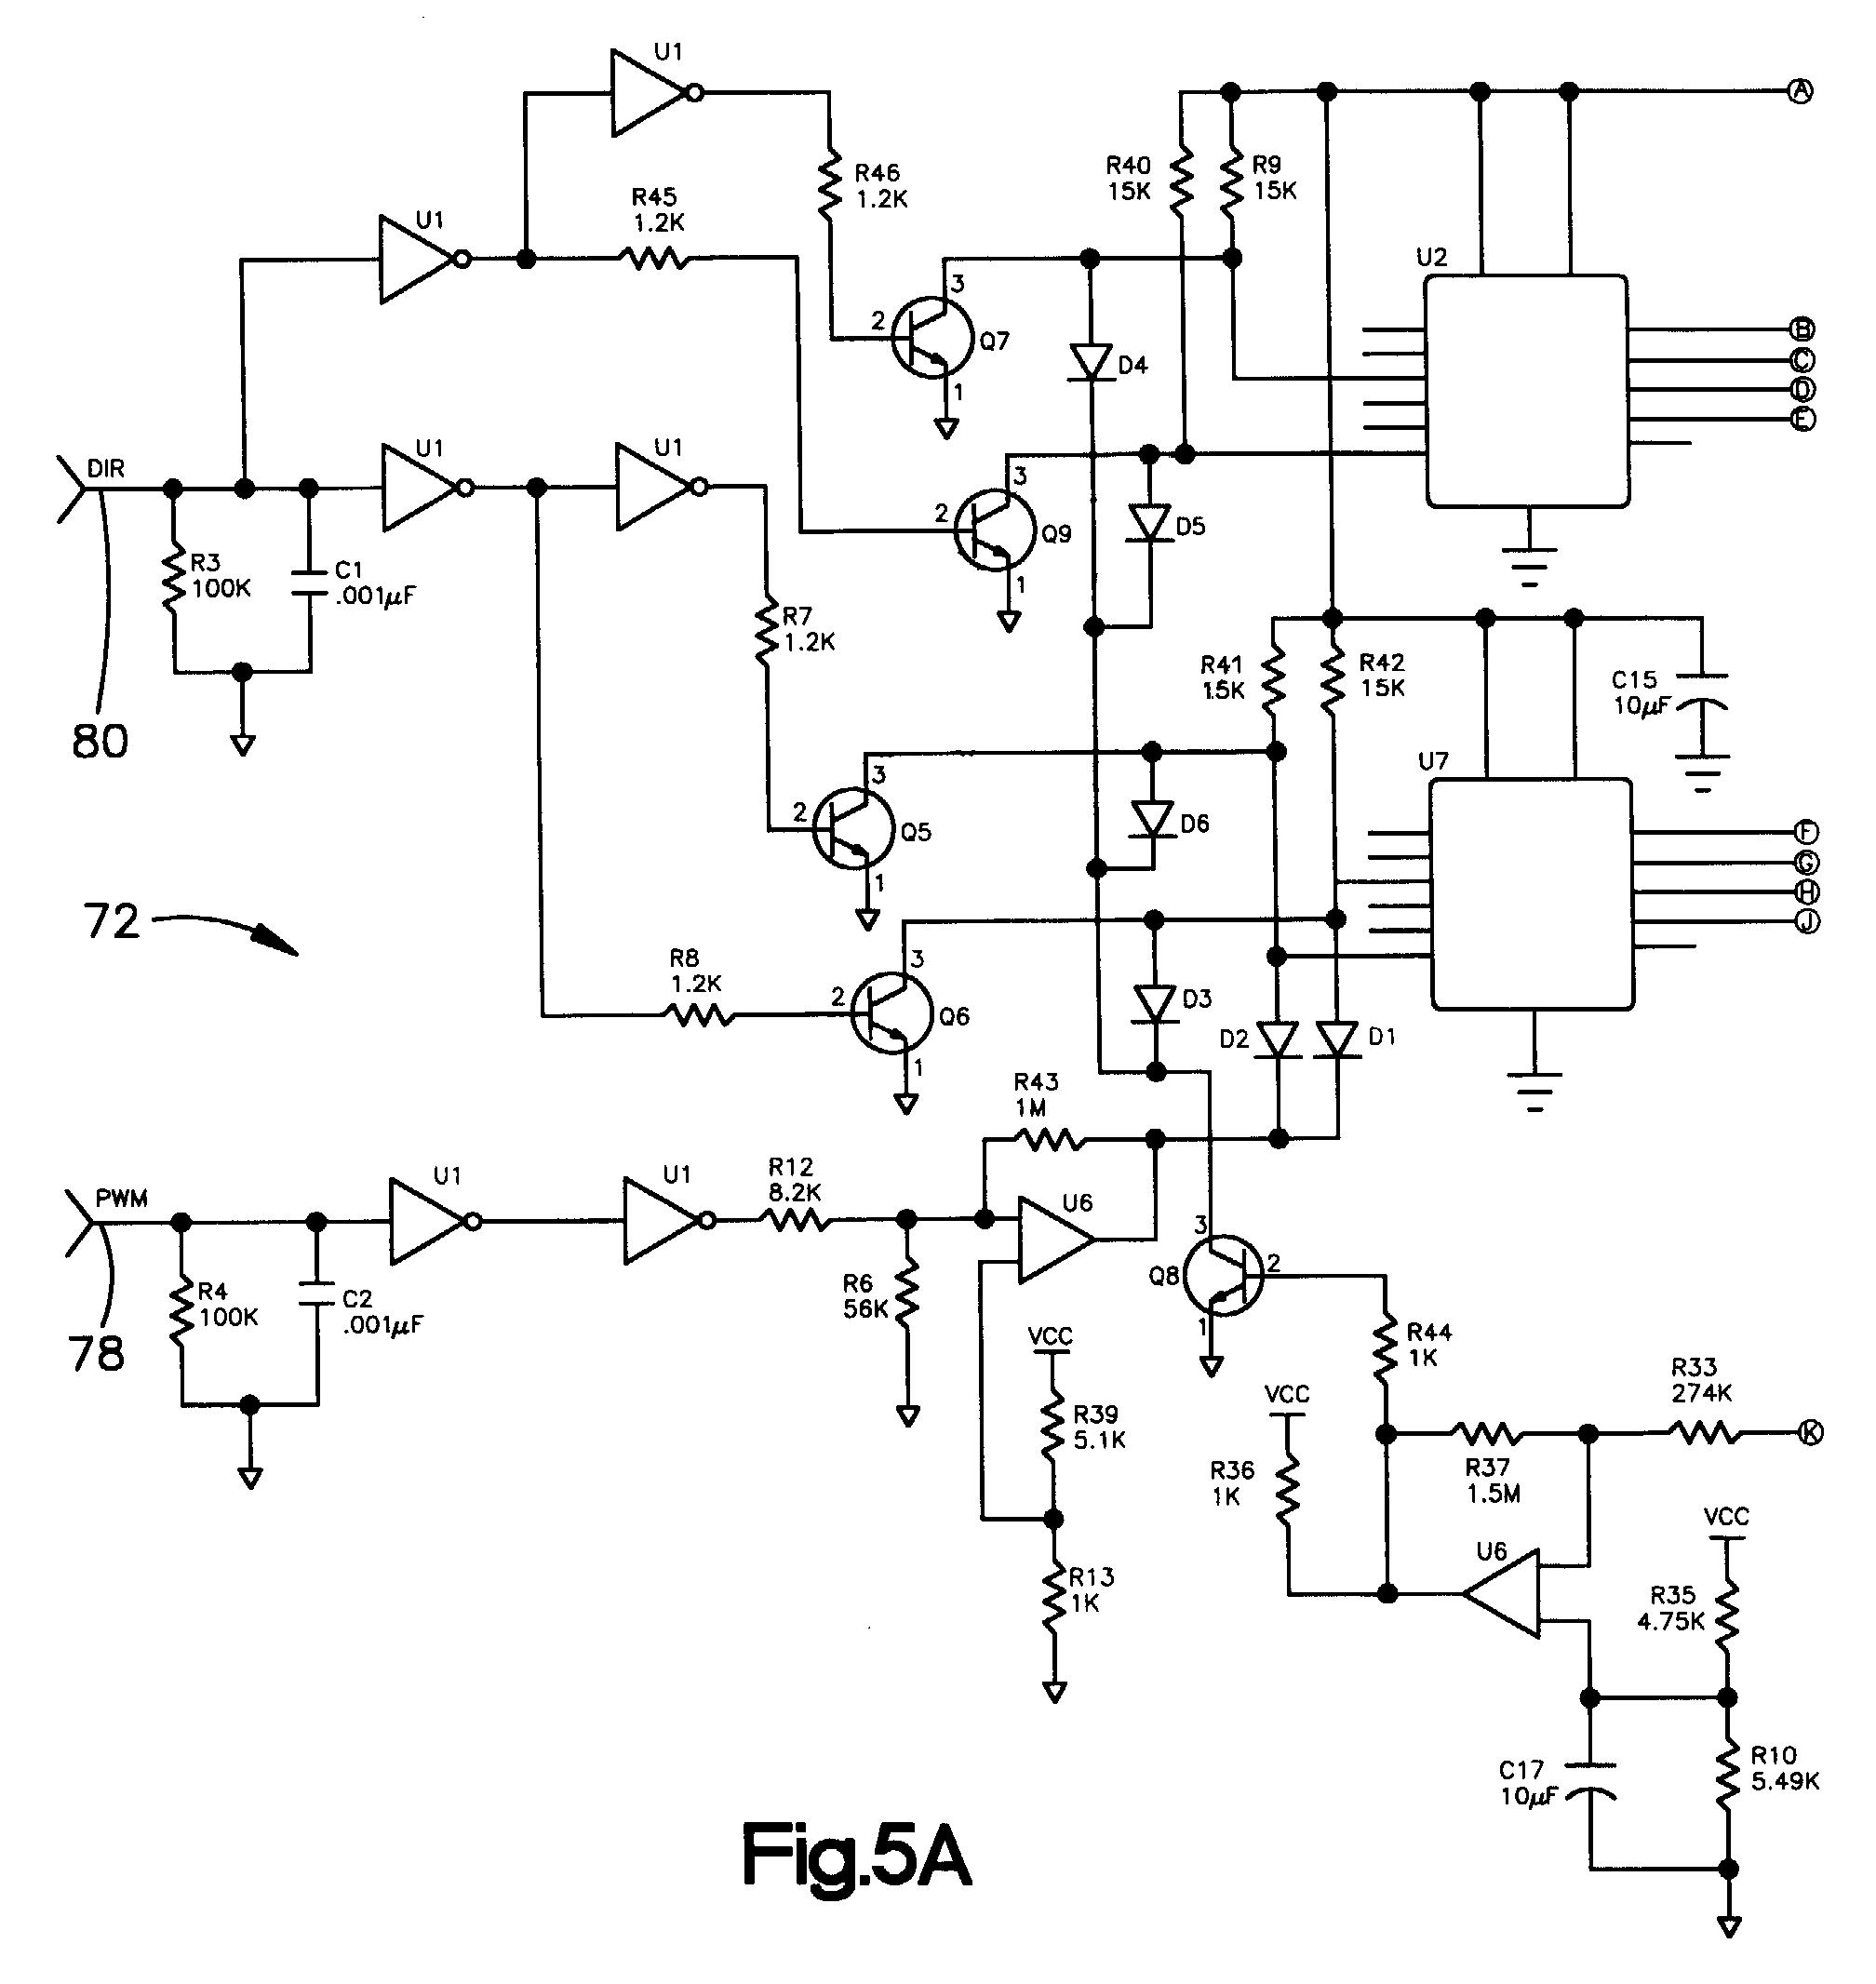 Biffi Icon 1000 Wiring Diagram 1978 Ford F 150 Wiring Diagram